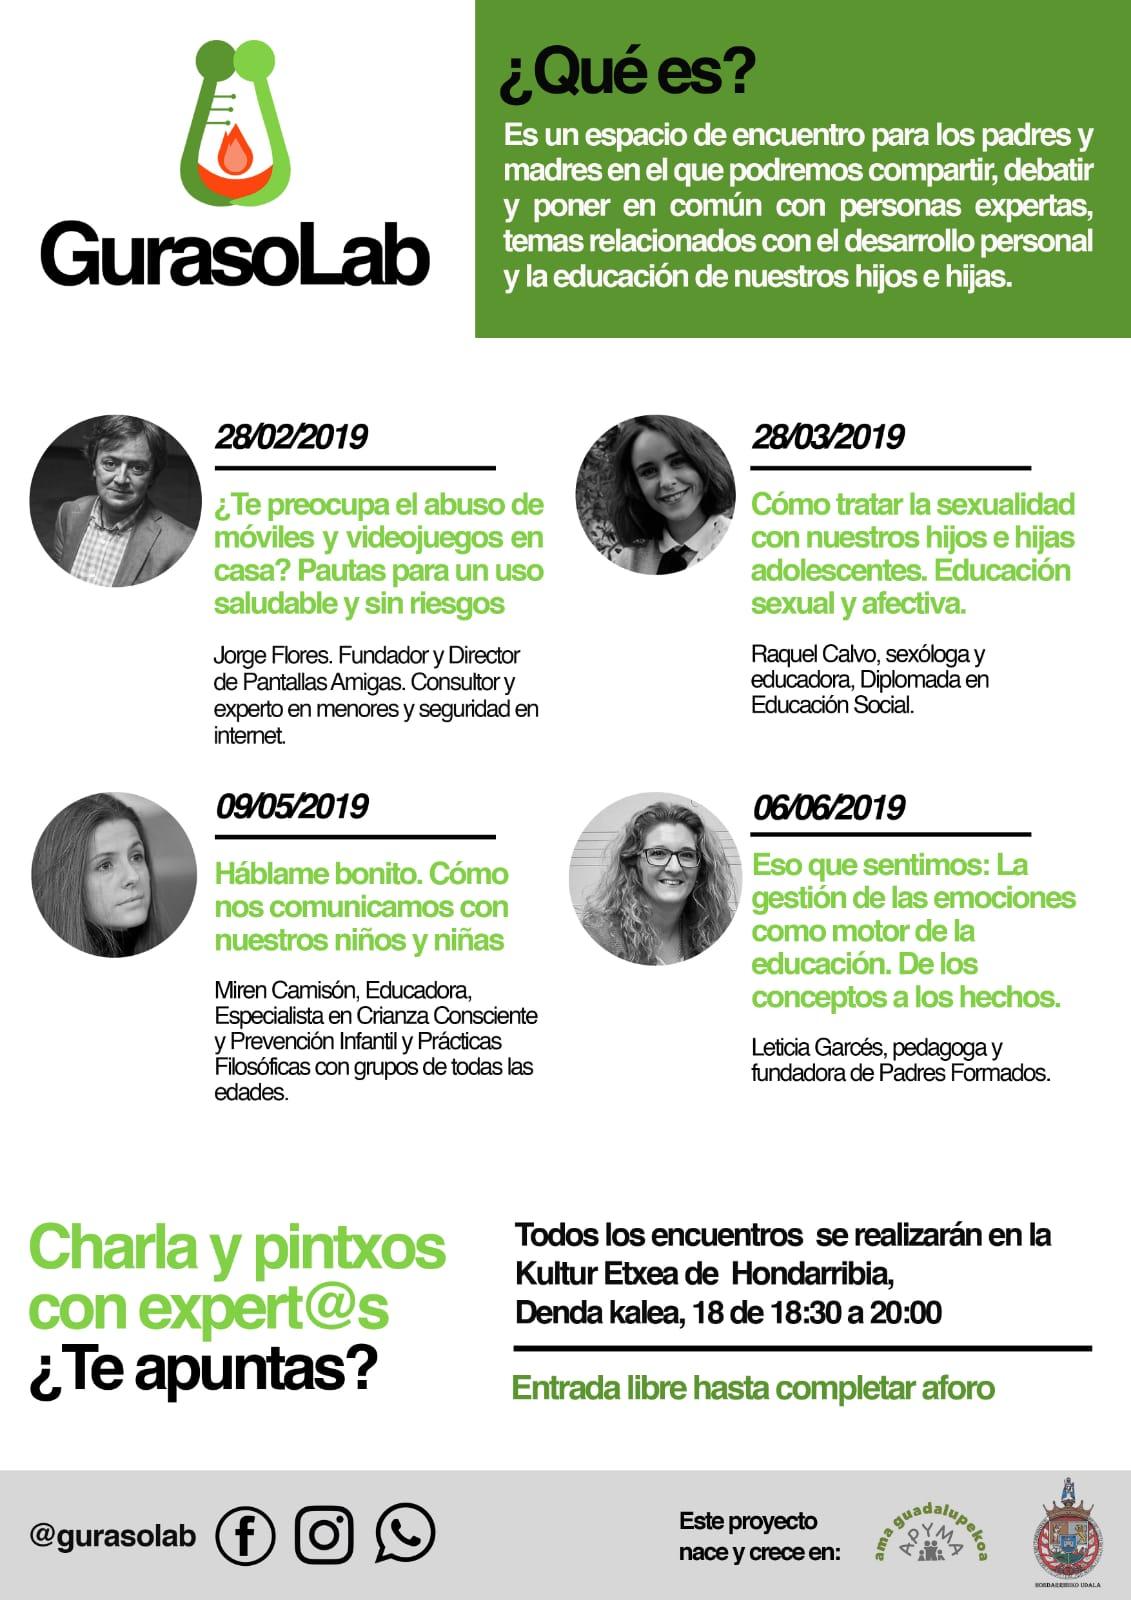 programa GurasoLab jornadas encuentro educación digital Hondarribi